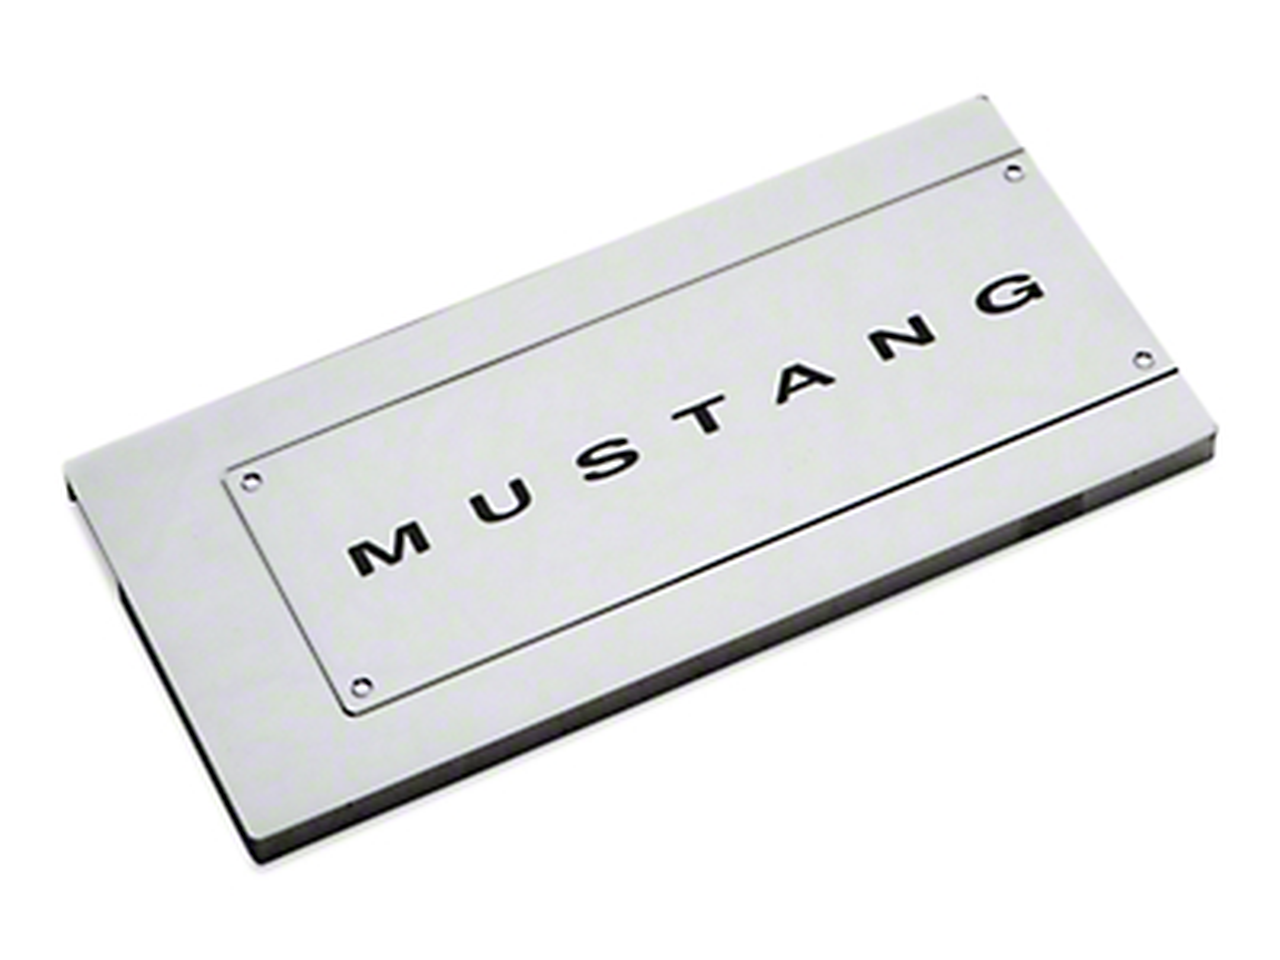 Modern Billet Chrome Fuse Box Cover - Mustang Lettering (05-09 All)